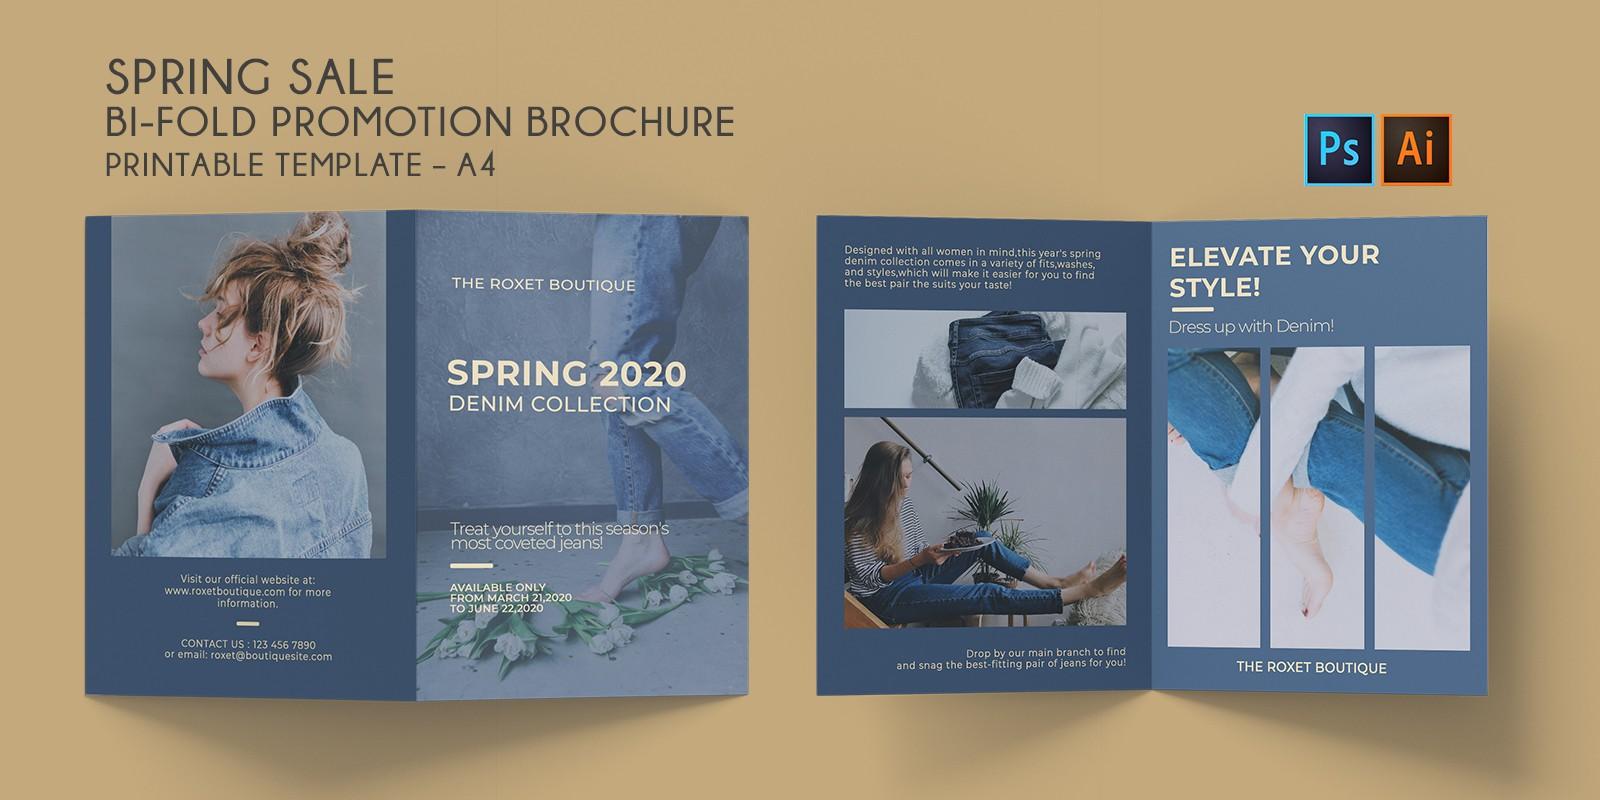 Bi-Fold Fashion Spring Sale Brochure A4